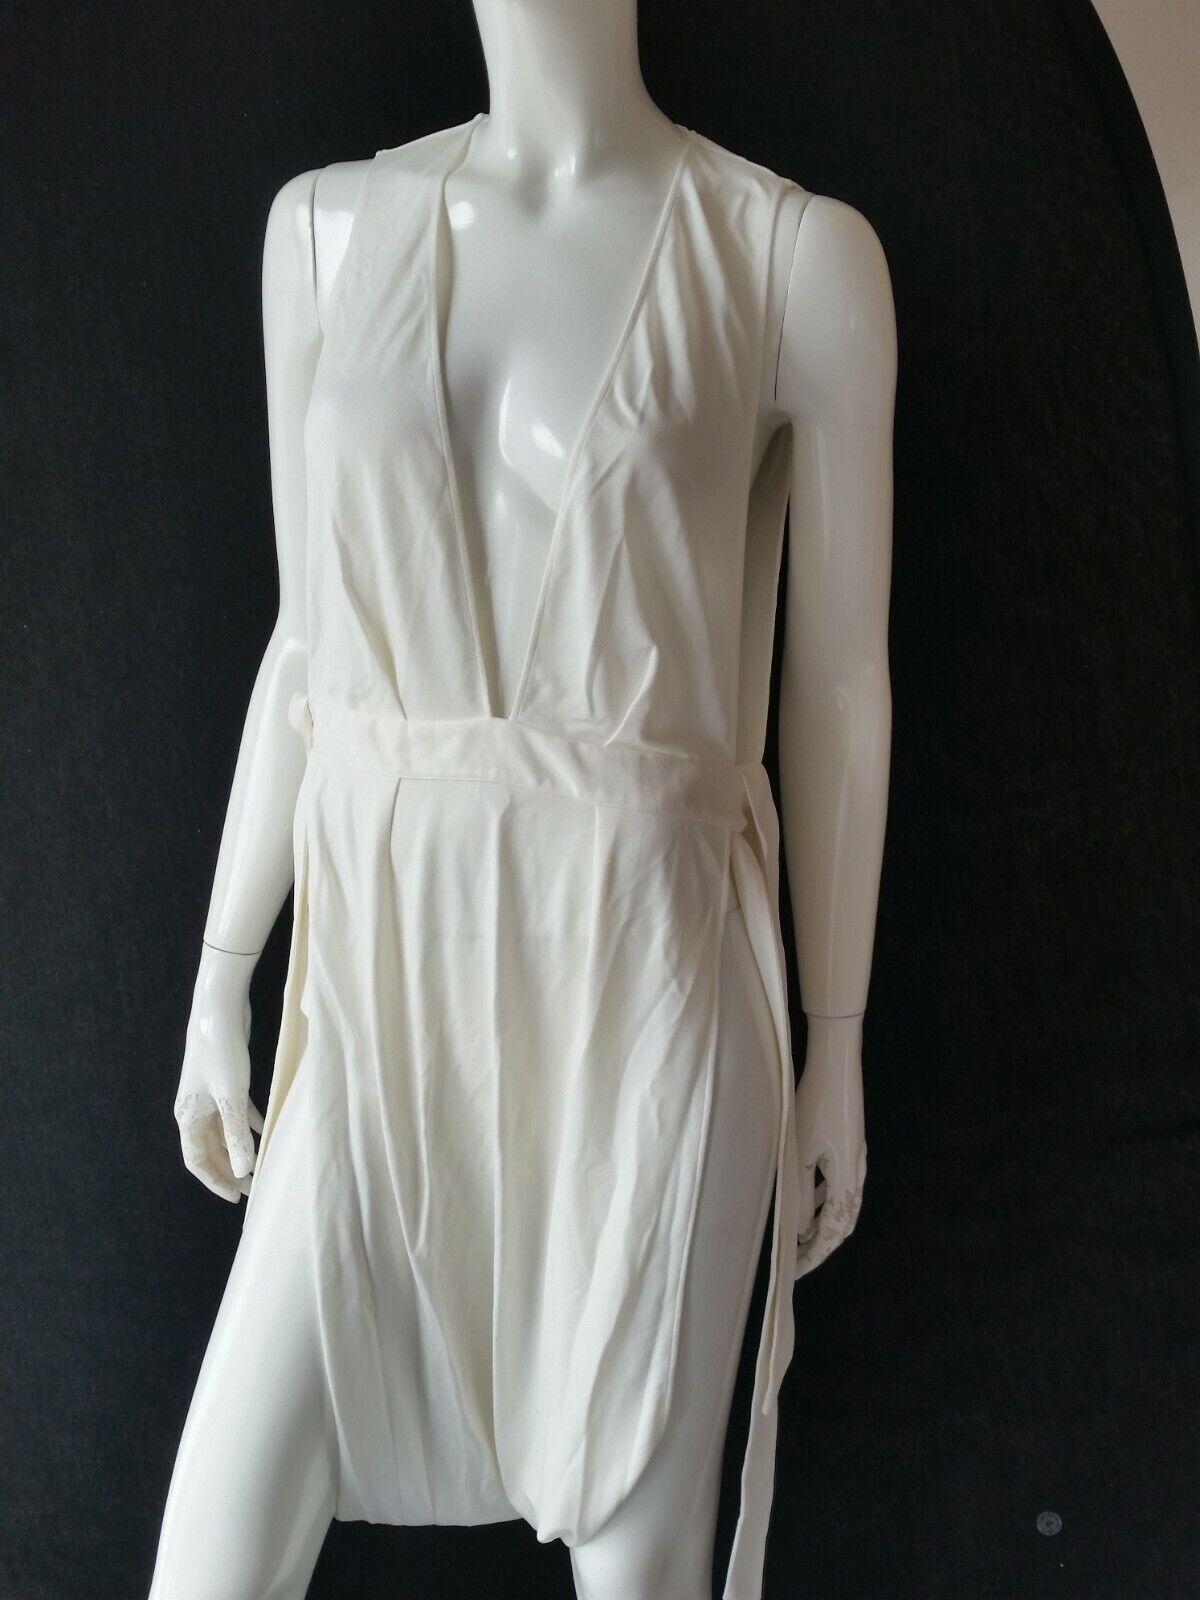 La Perla Beach Dress White Size 40 = UK16 = IT46 -- RRP Euro 380 *** NEW